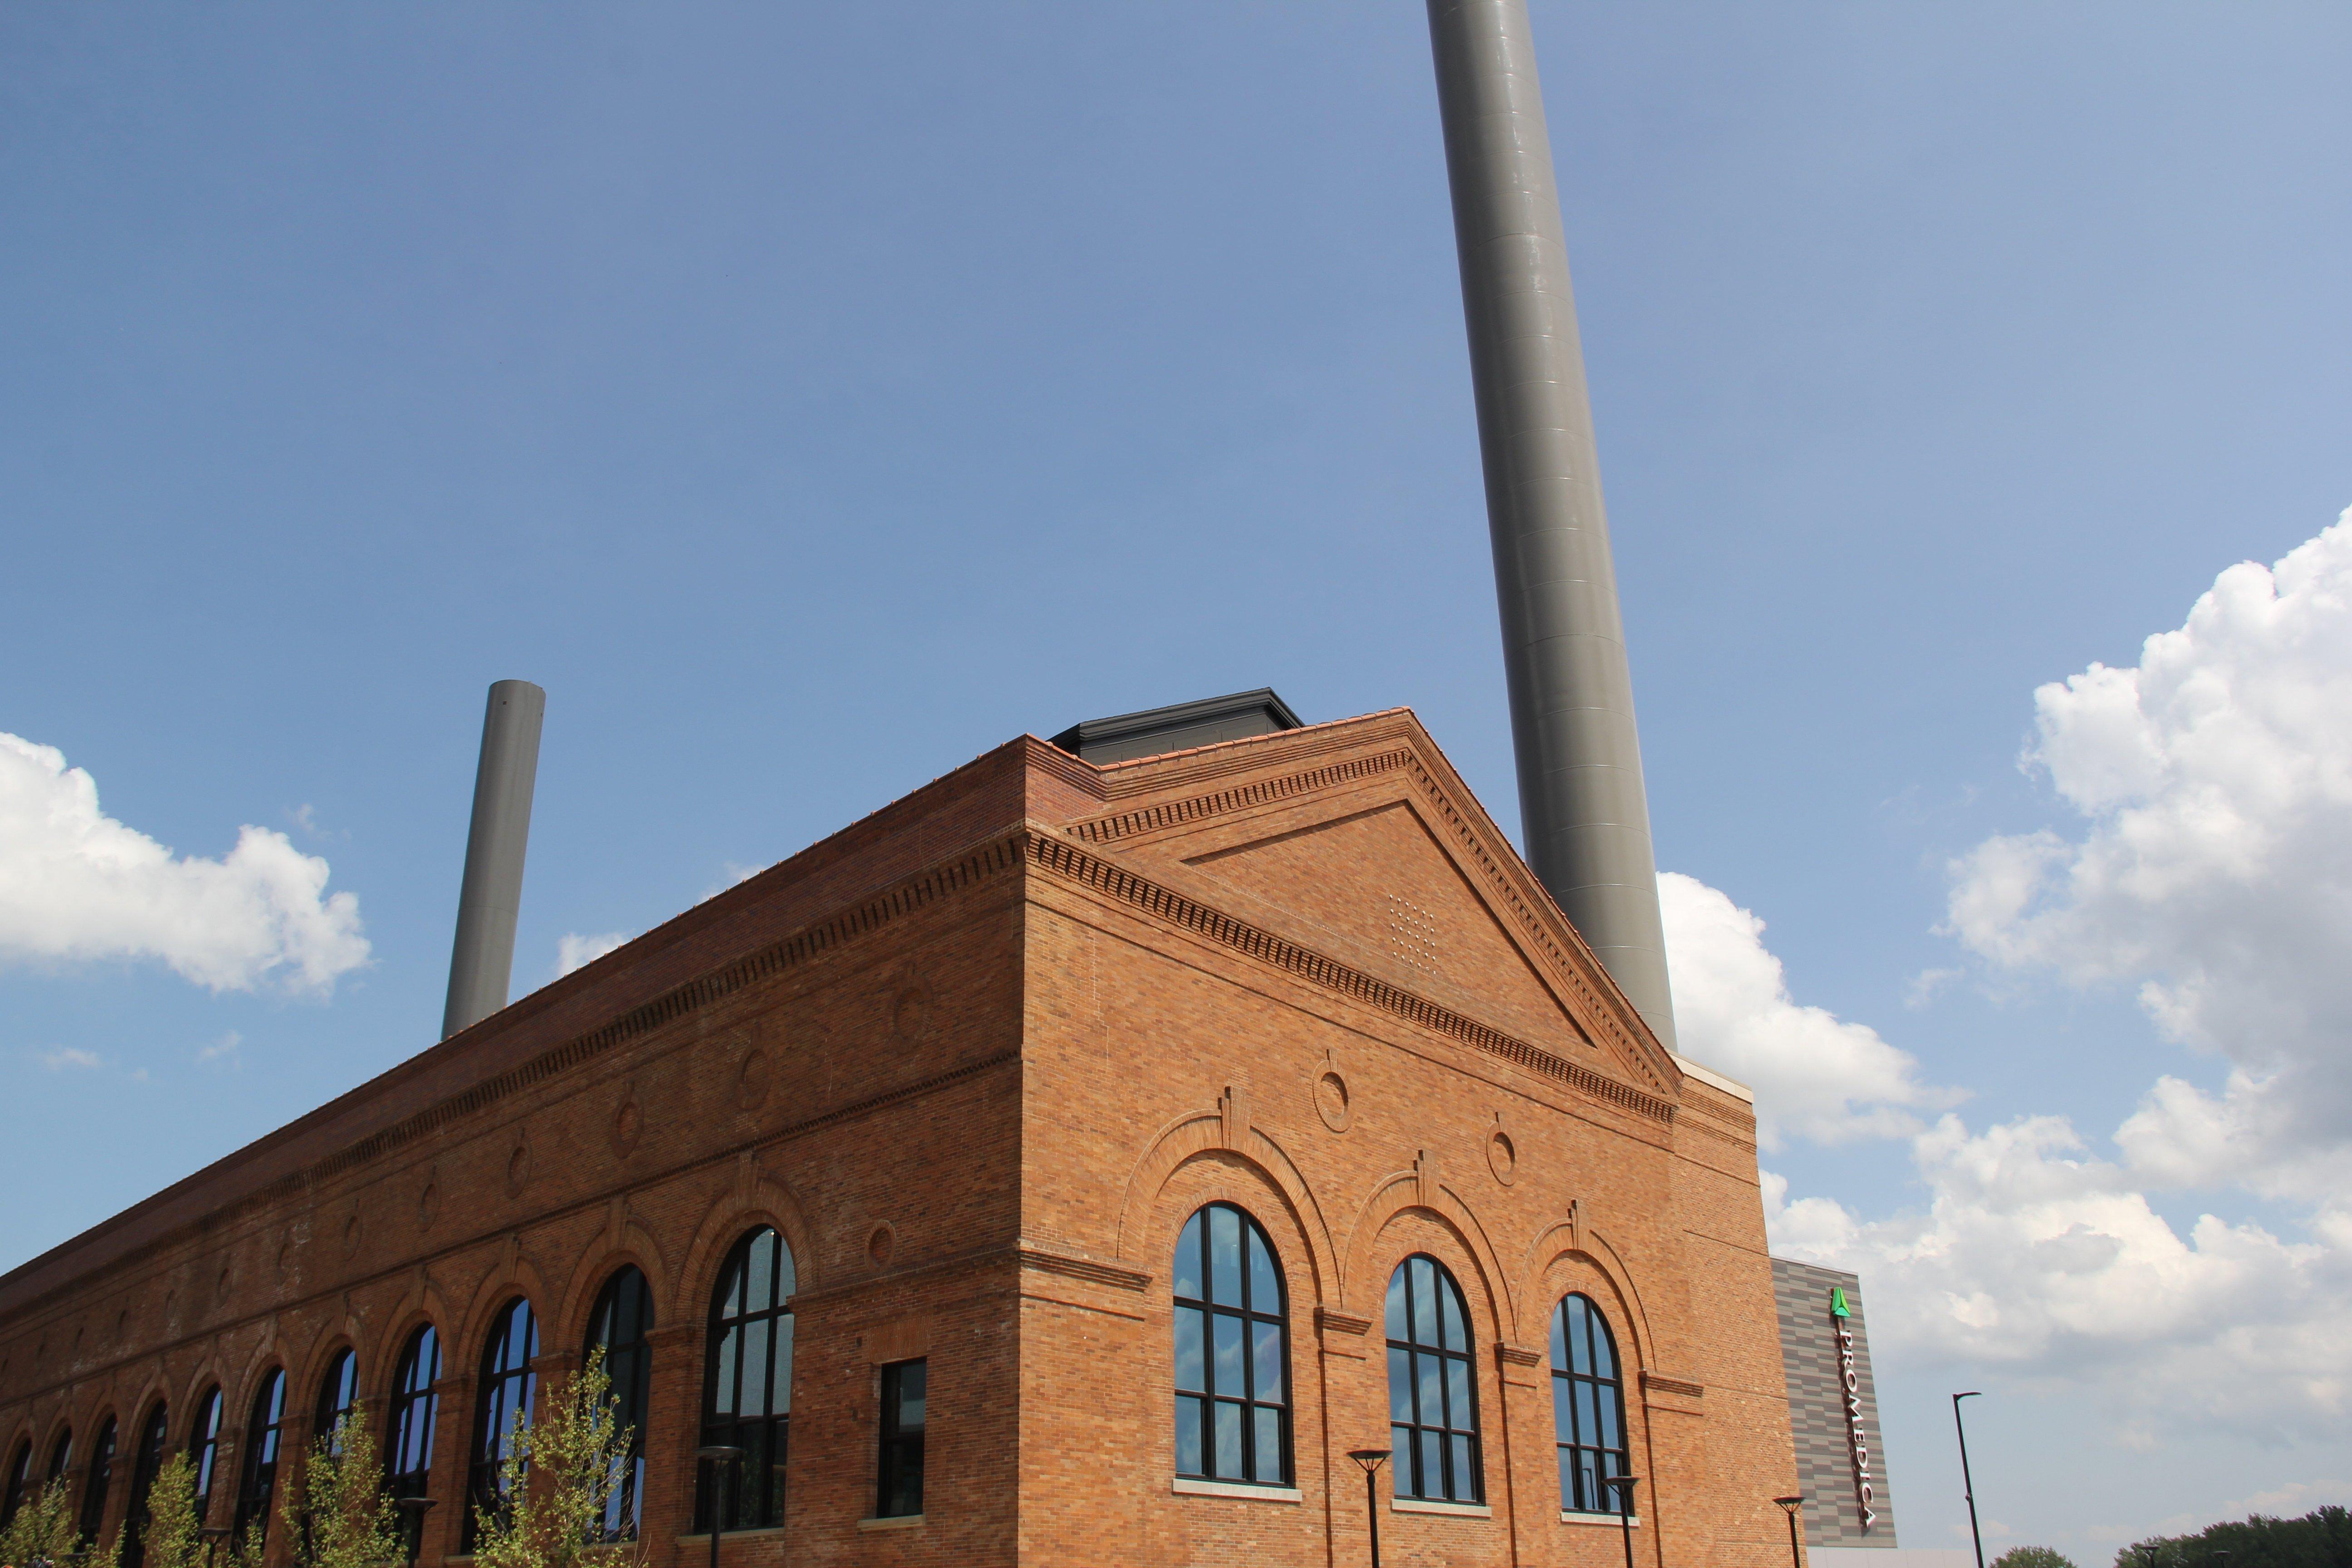 ProMedica Downtown Toledo Headquarters - The Steam Plant Building